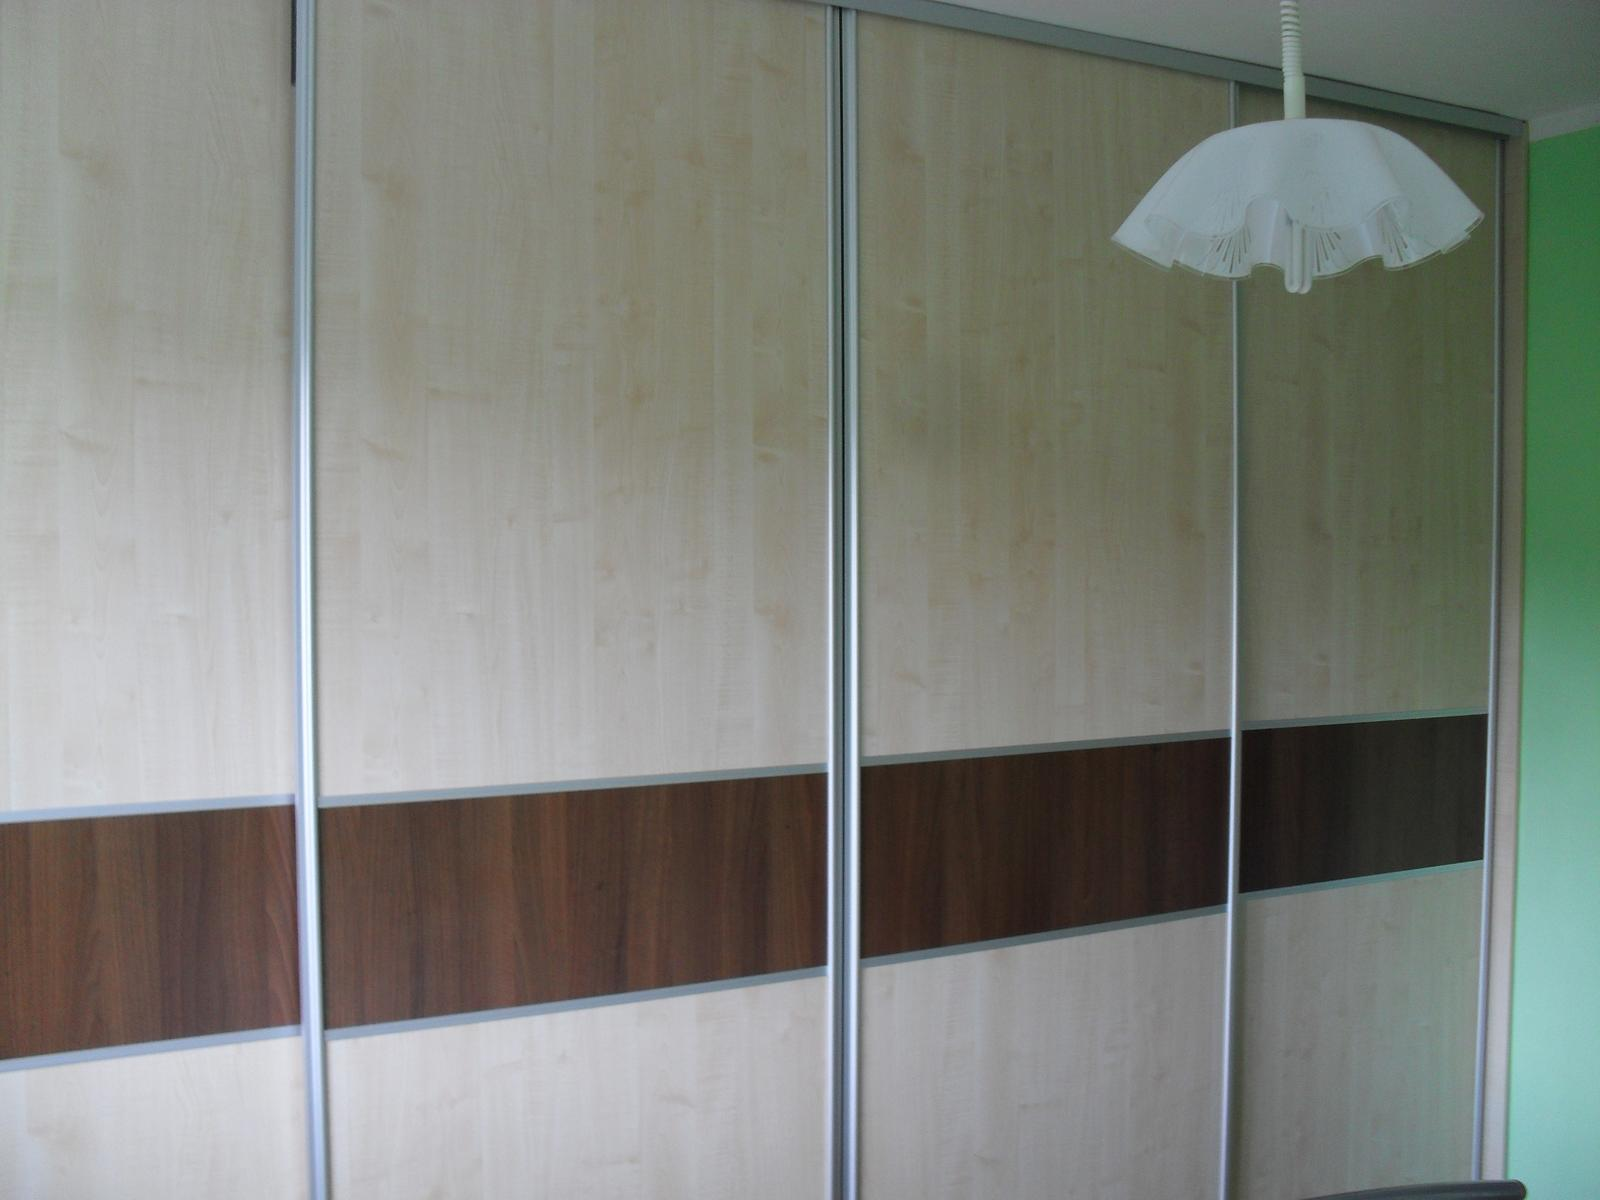 Vstavané skrine Martin Benko Bošany - Obrázok č. 6